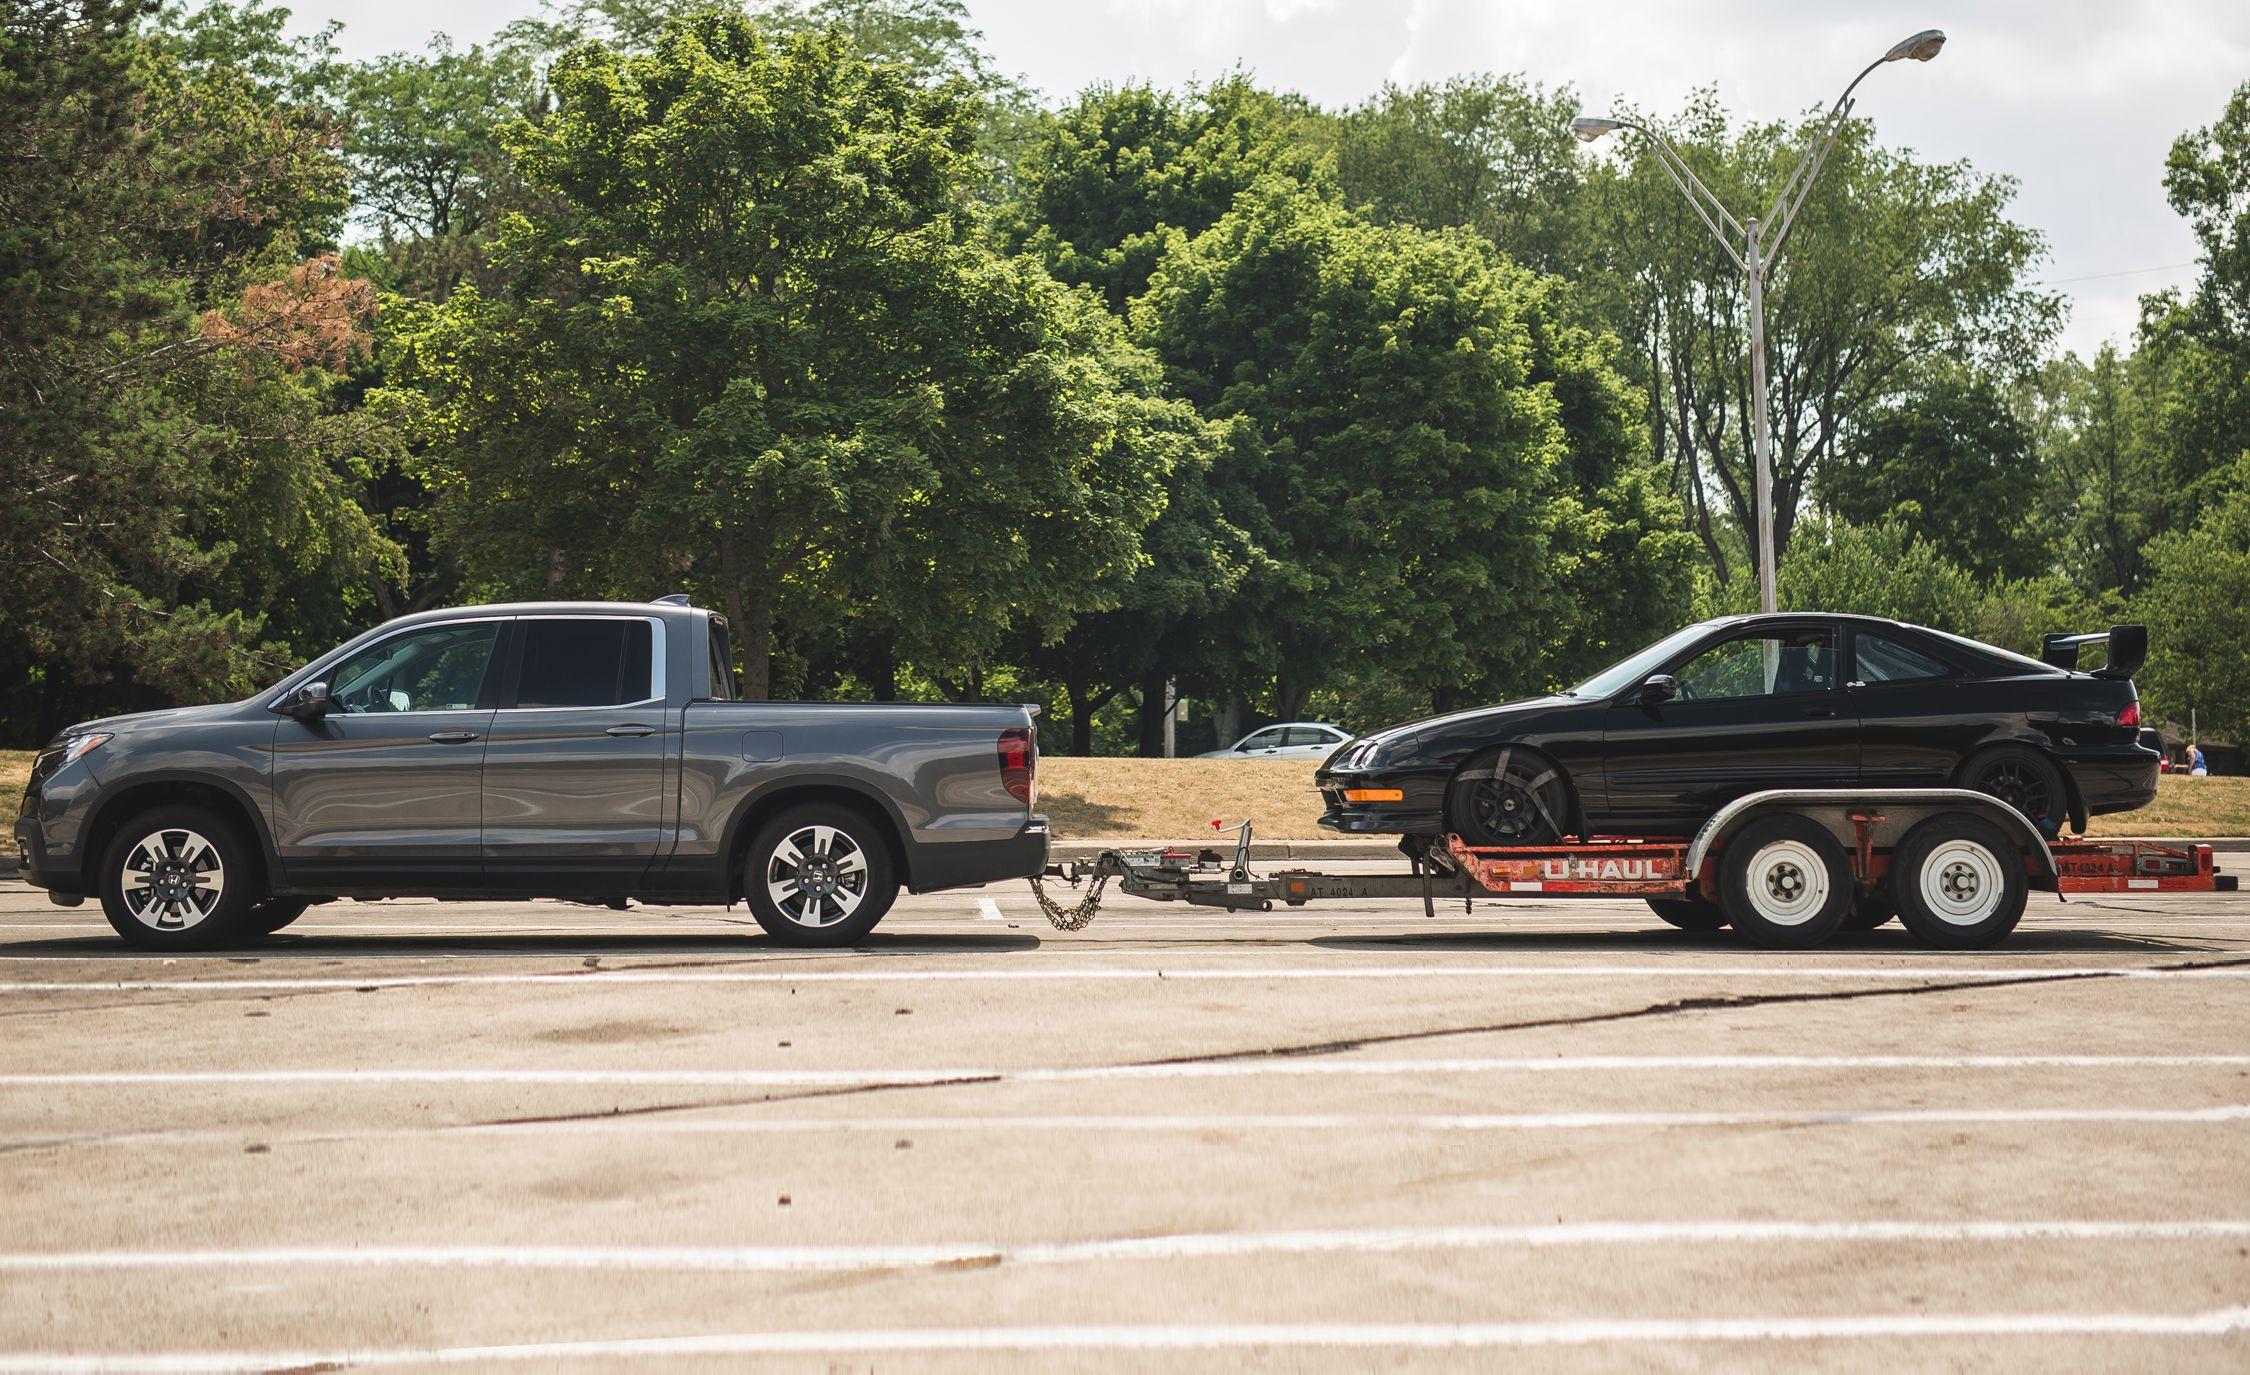 2019 Honda Ridgeline: Testing Towing in Our Long-Term Unibody Pickup